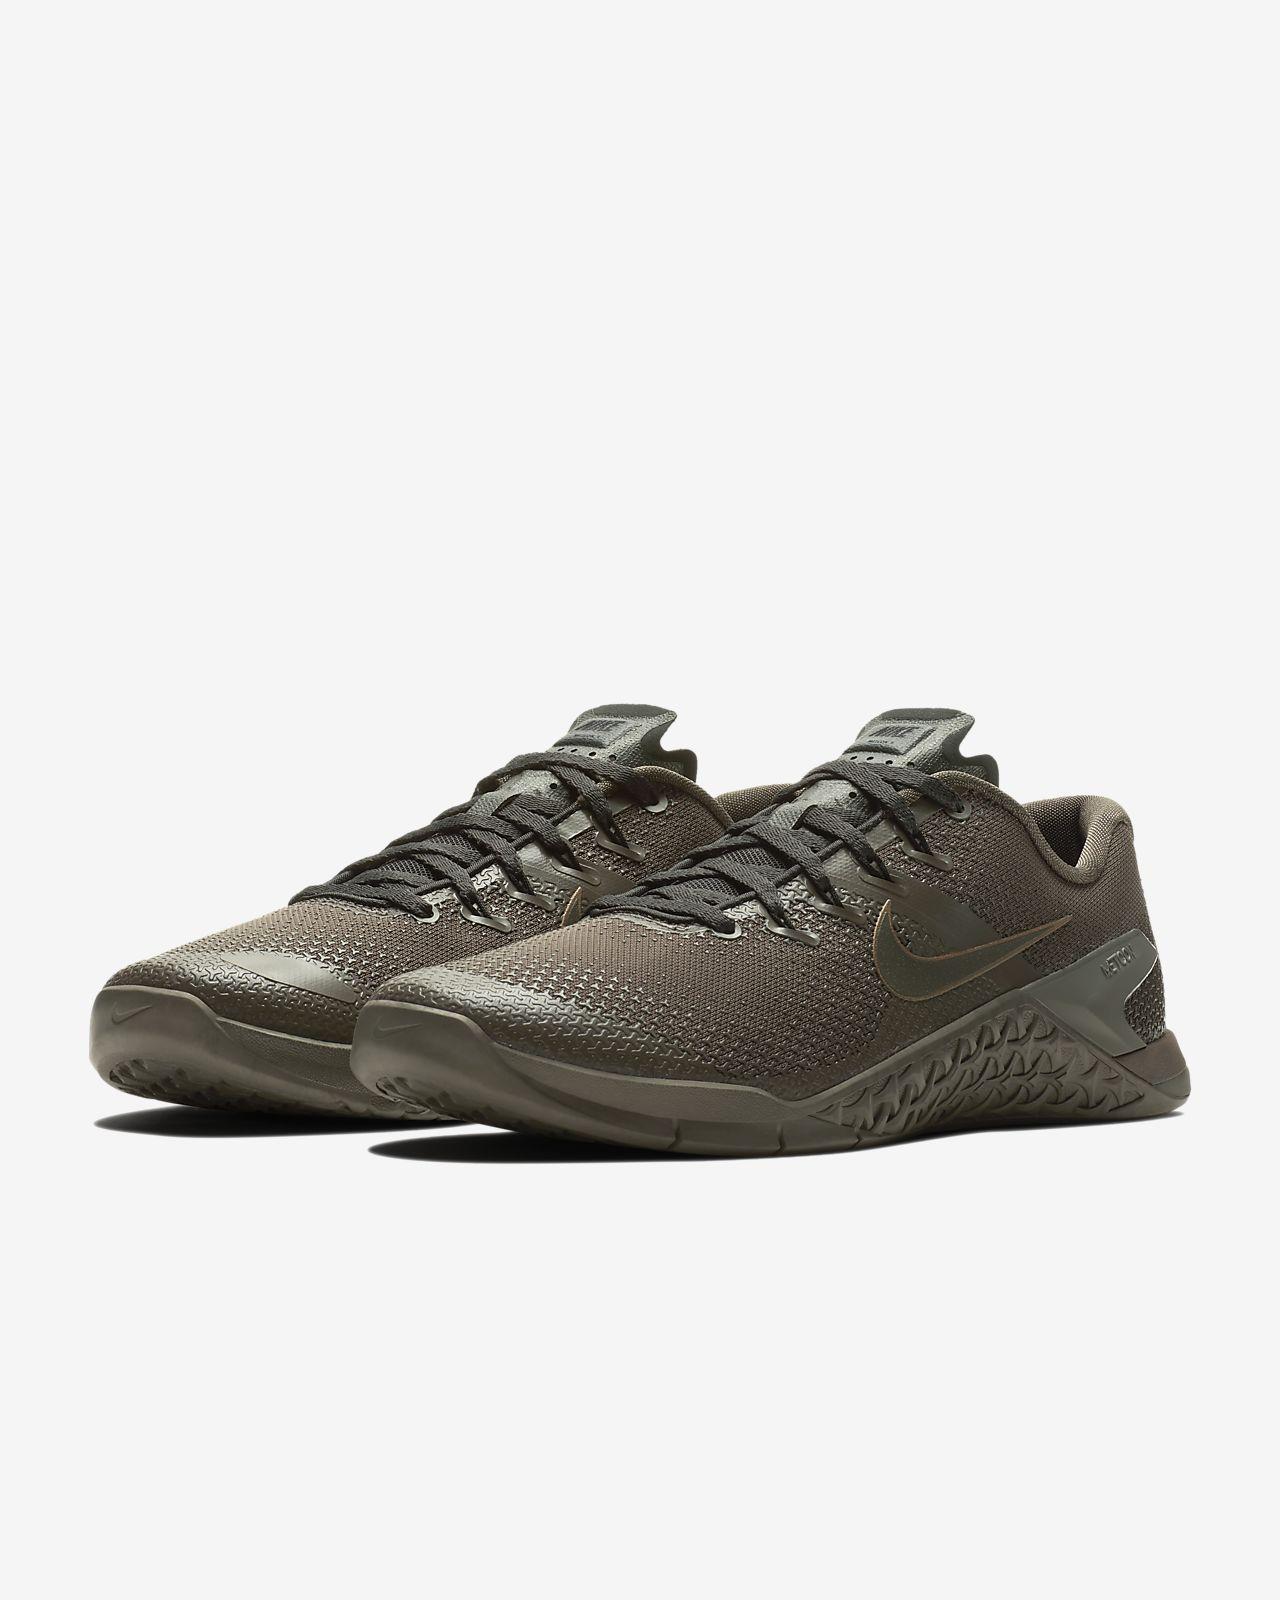 ... Nike Metcon 4 Viking Quest Men's Training Shoe